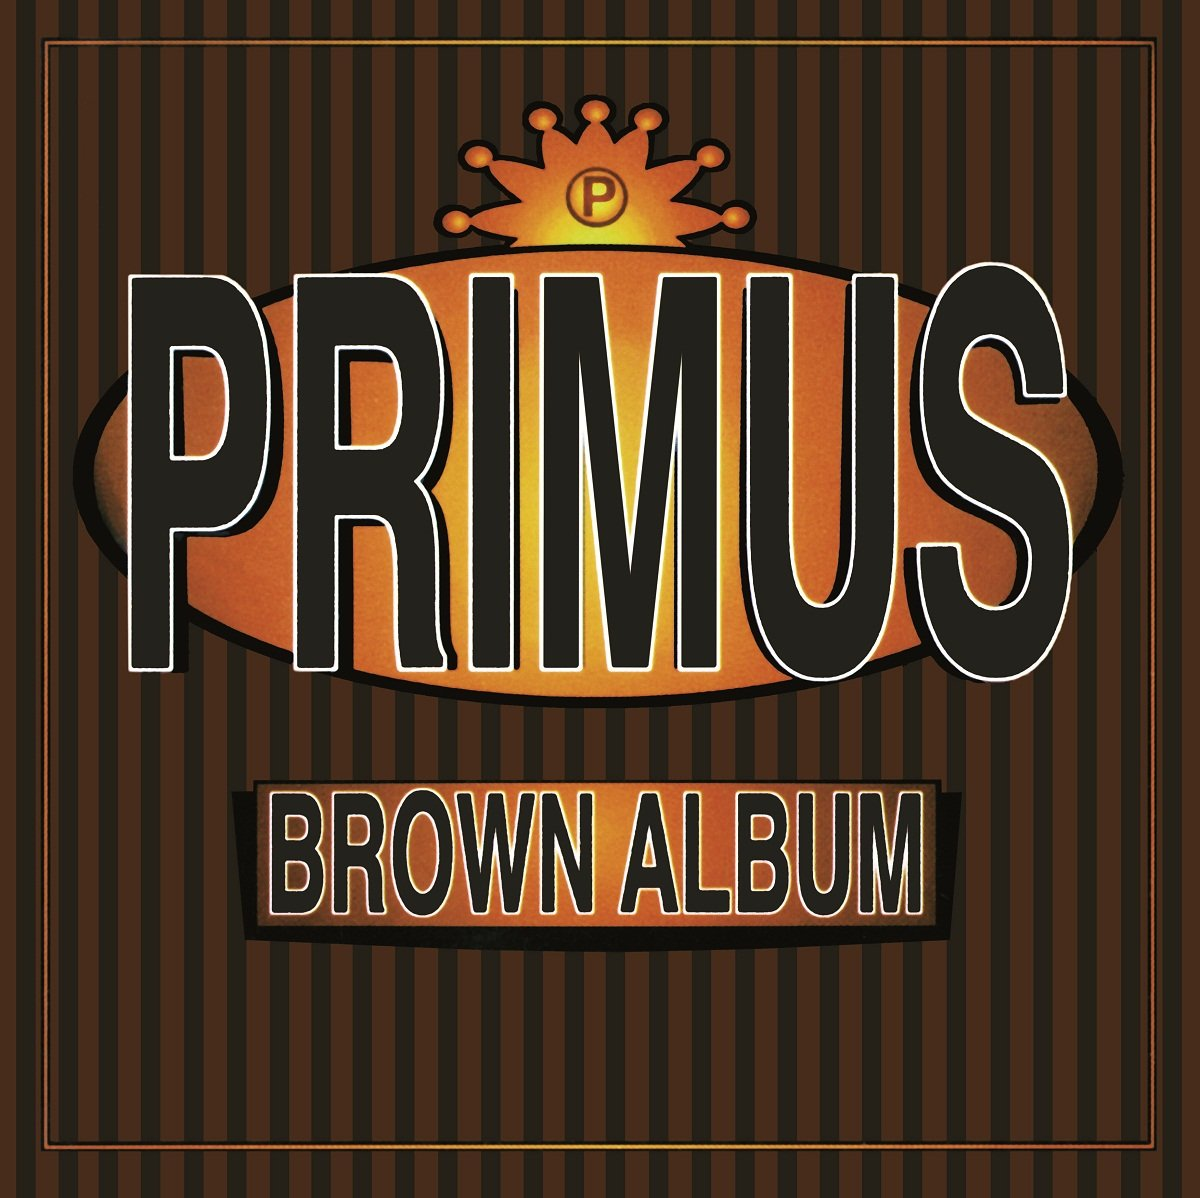 Brown Album [12 inch Analog]                                                                                                                                                                                                                                                    <span class=